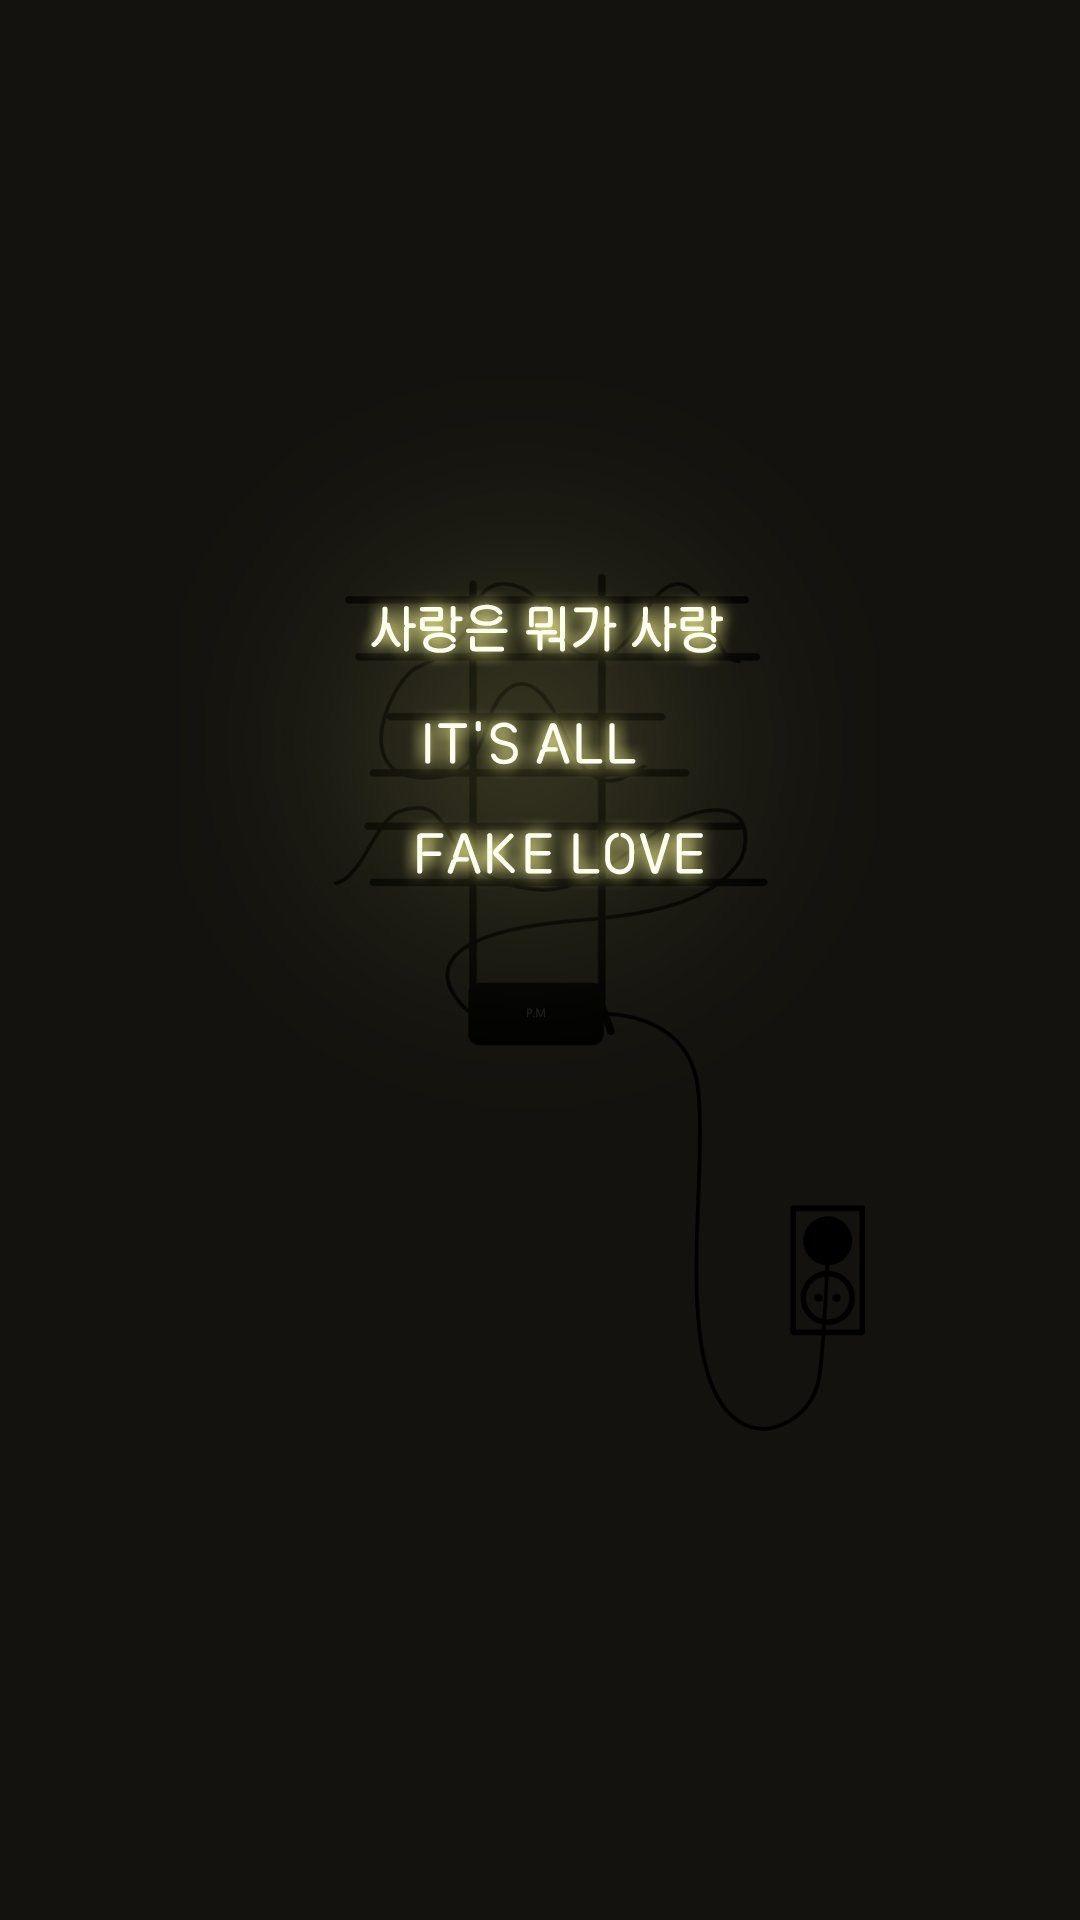 Bts Lyrics Desktop Wallpaper Posted By Michelle Anderson